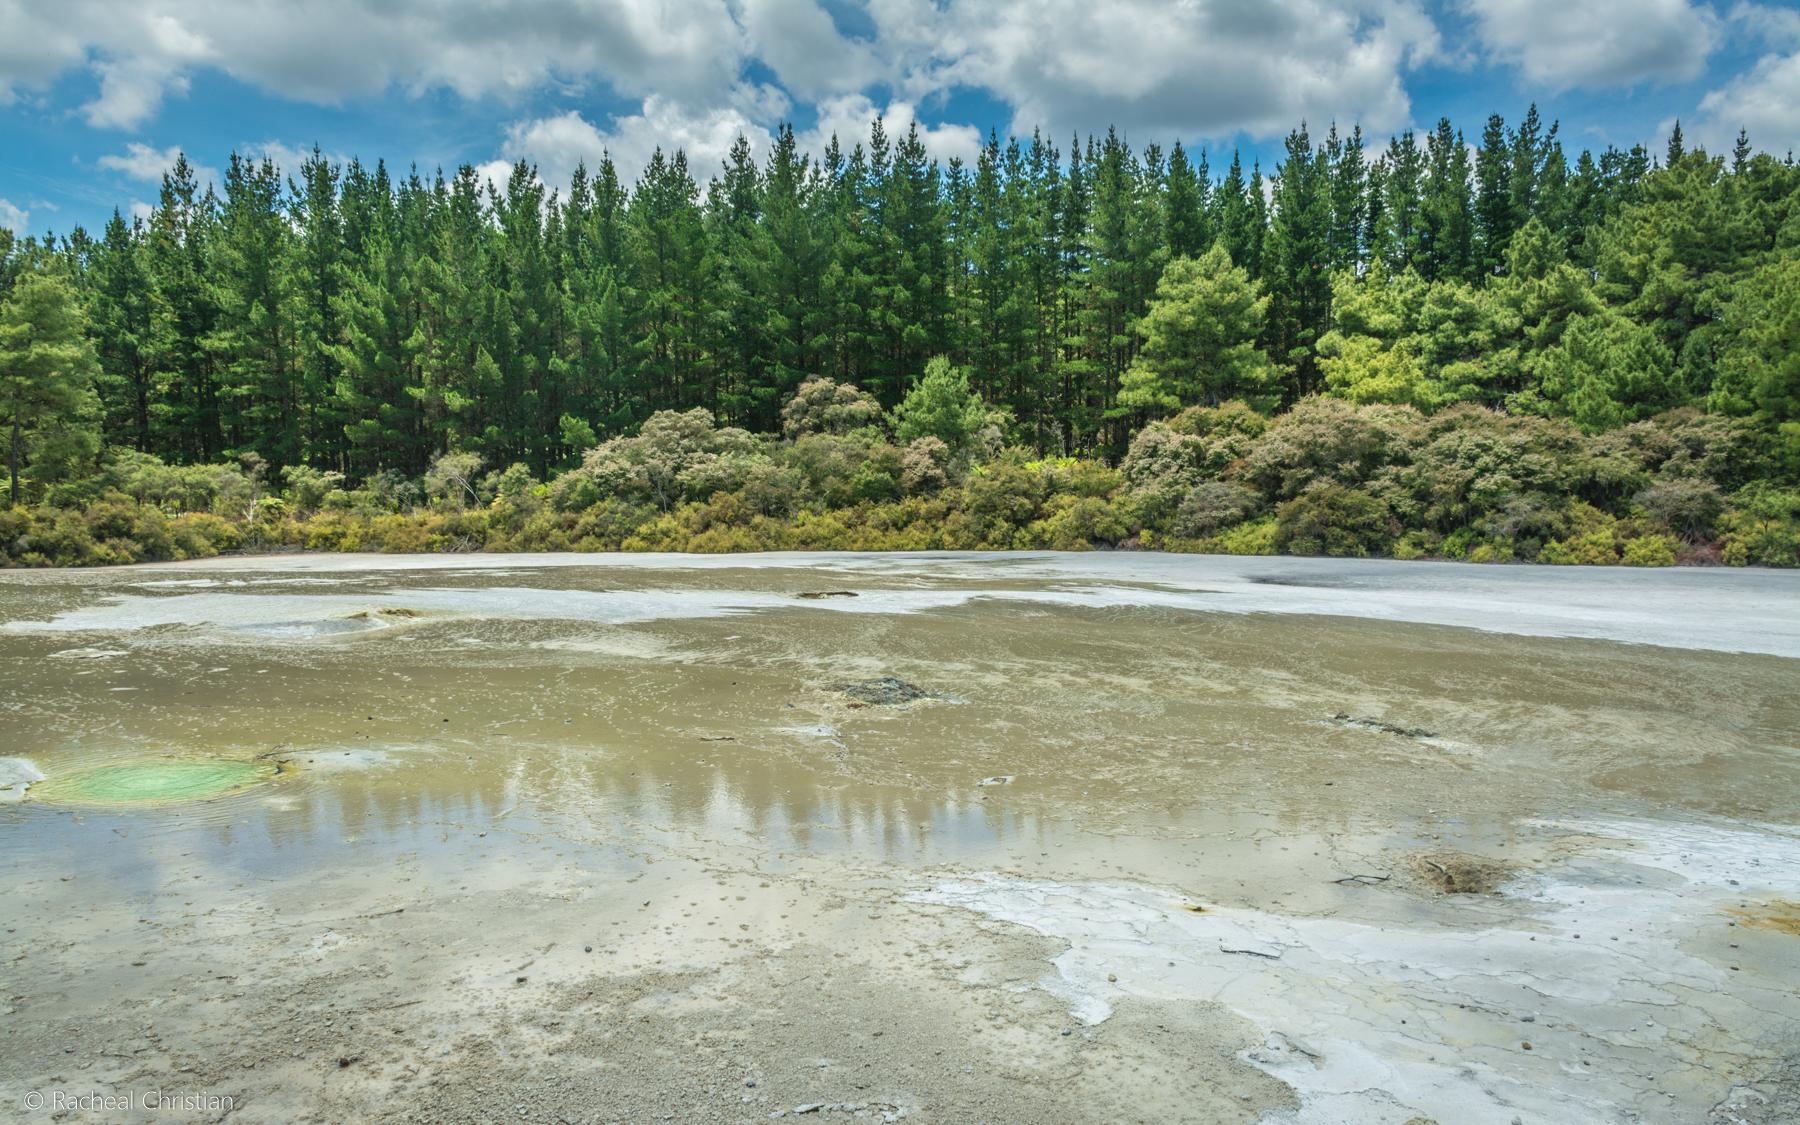 Wai-O-Tapu Thermal Wonderland  Rotorua, New Zealand by Racheal Christian